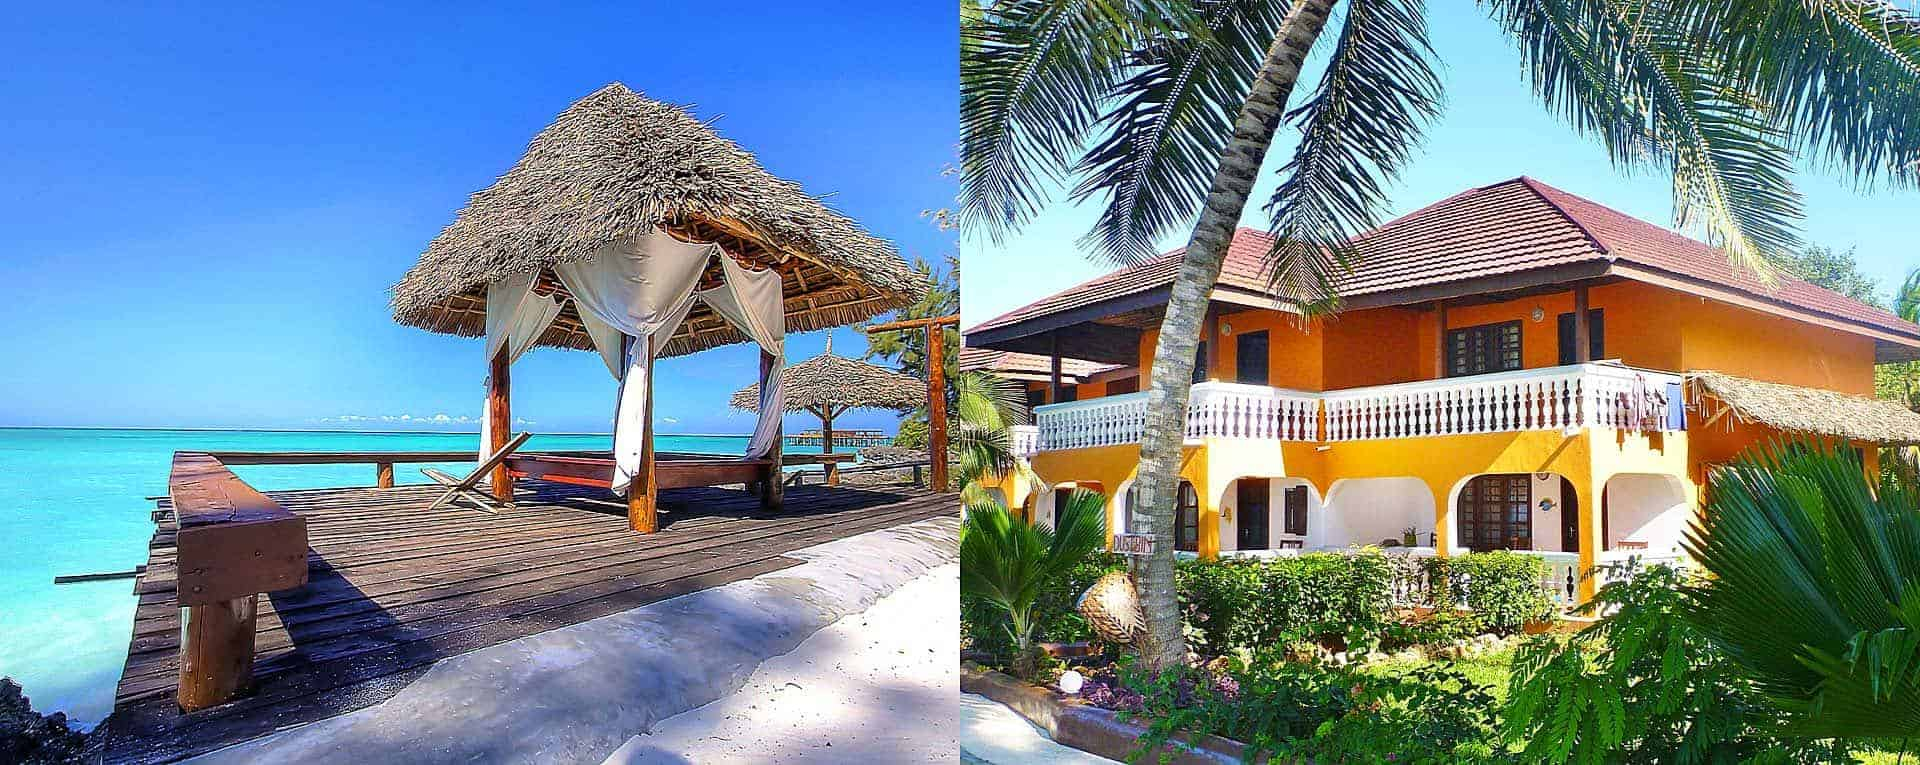 Stupendous Mnarani Beach Cottages Zanzibar Beach Accommodation In Download Free Architecture Designs Rallybritishbridgeorg